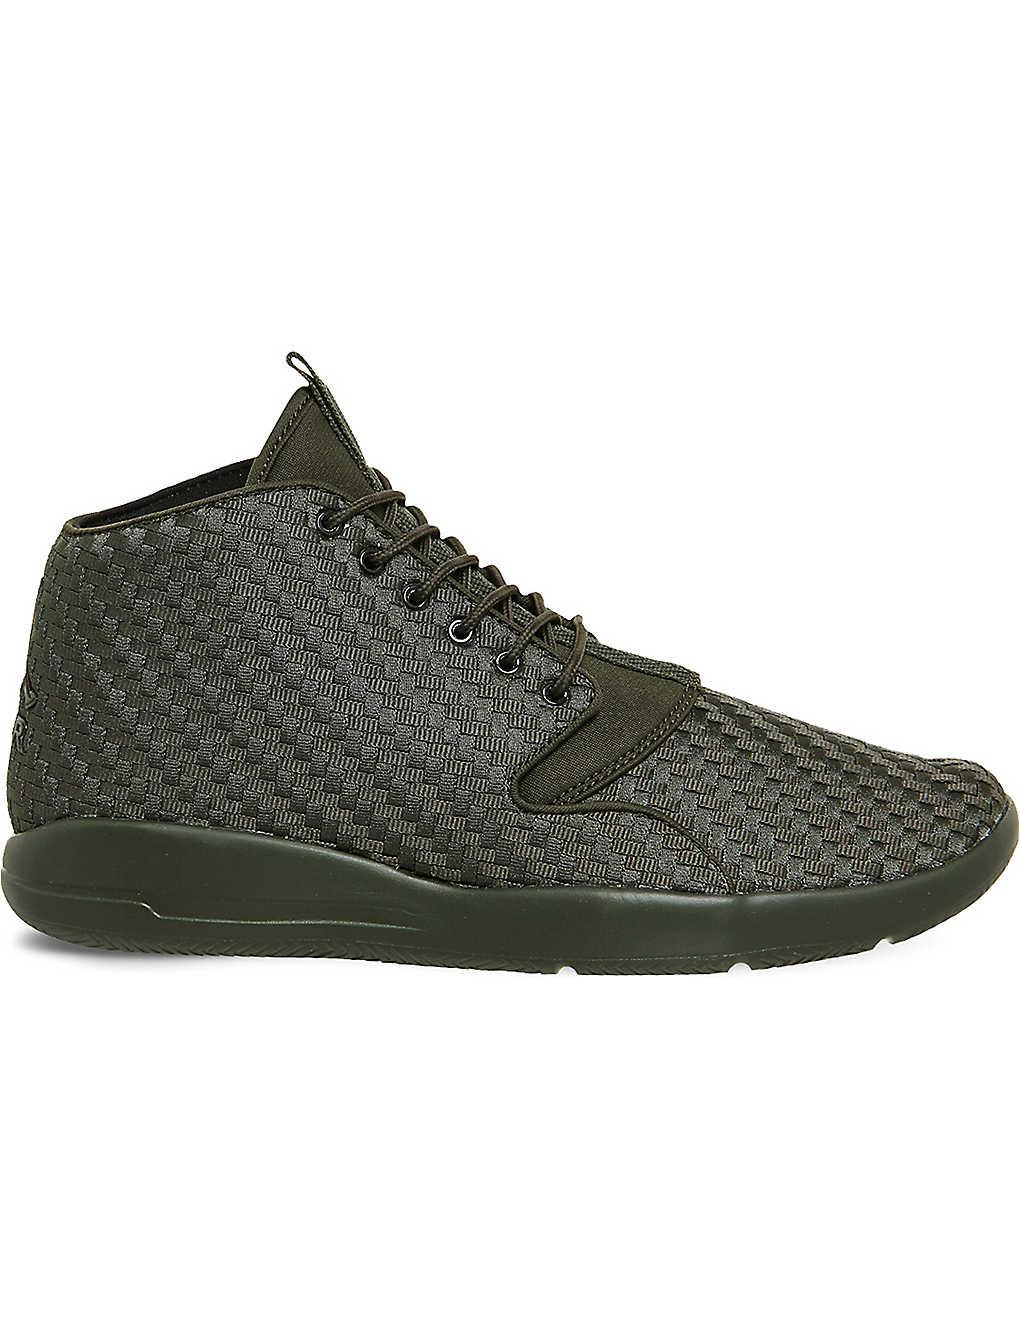 f501a923e6f690 NIKE - Jordan Eclipse chukka trainers